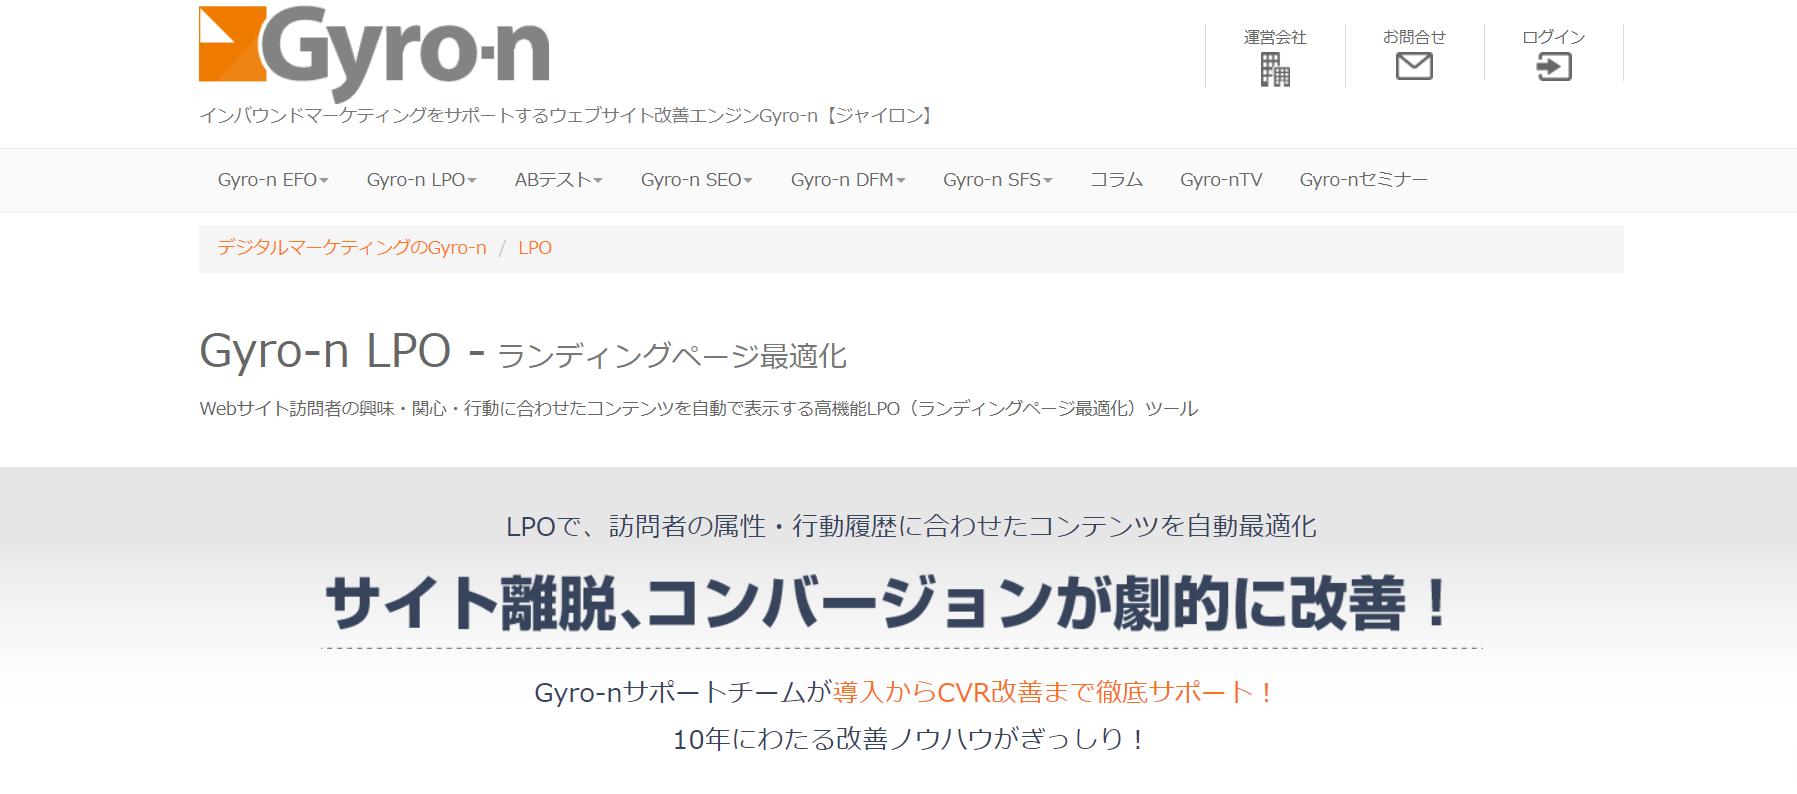 Gyron-LPO